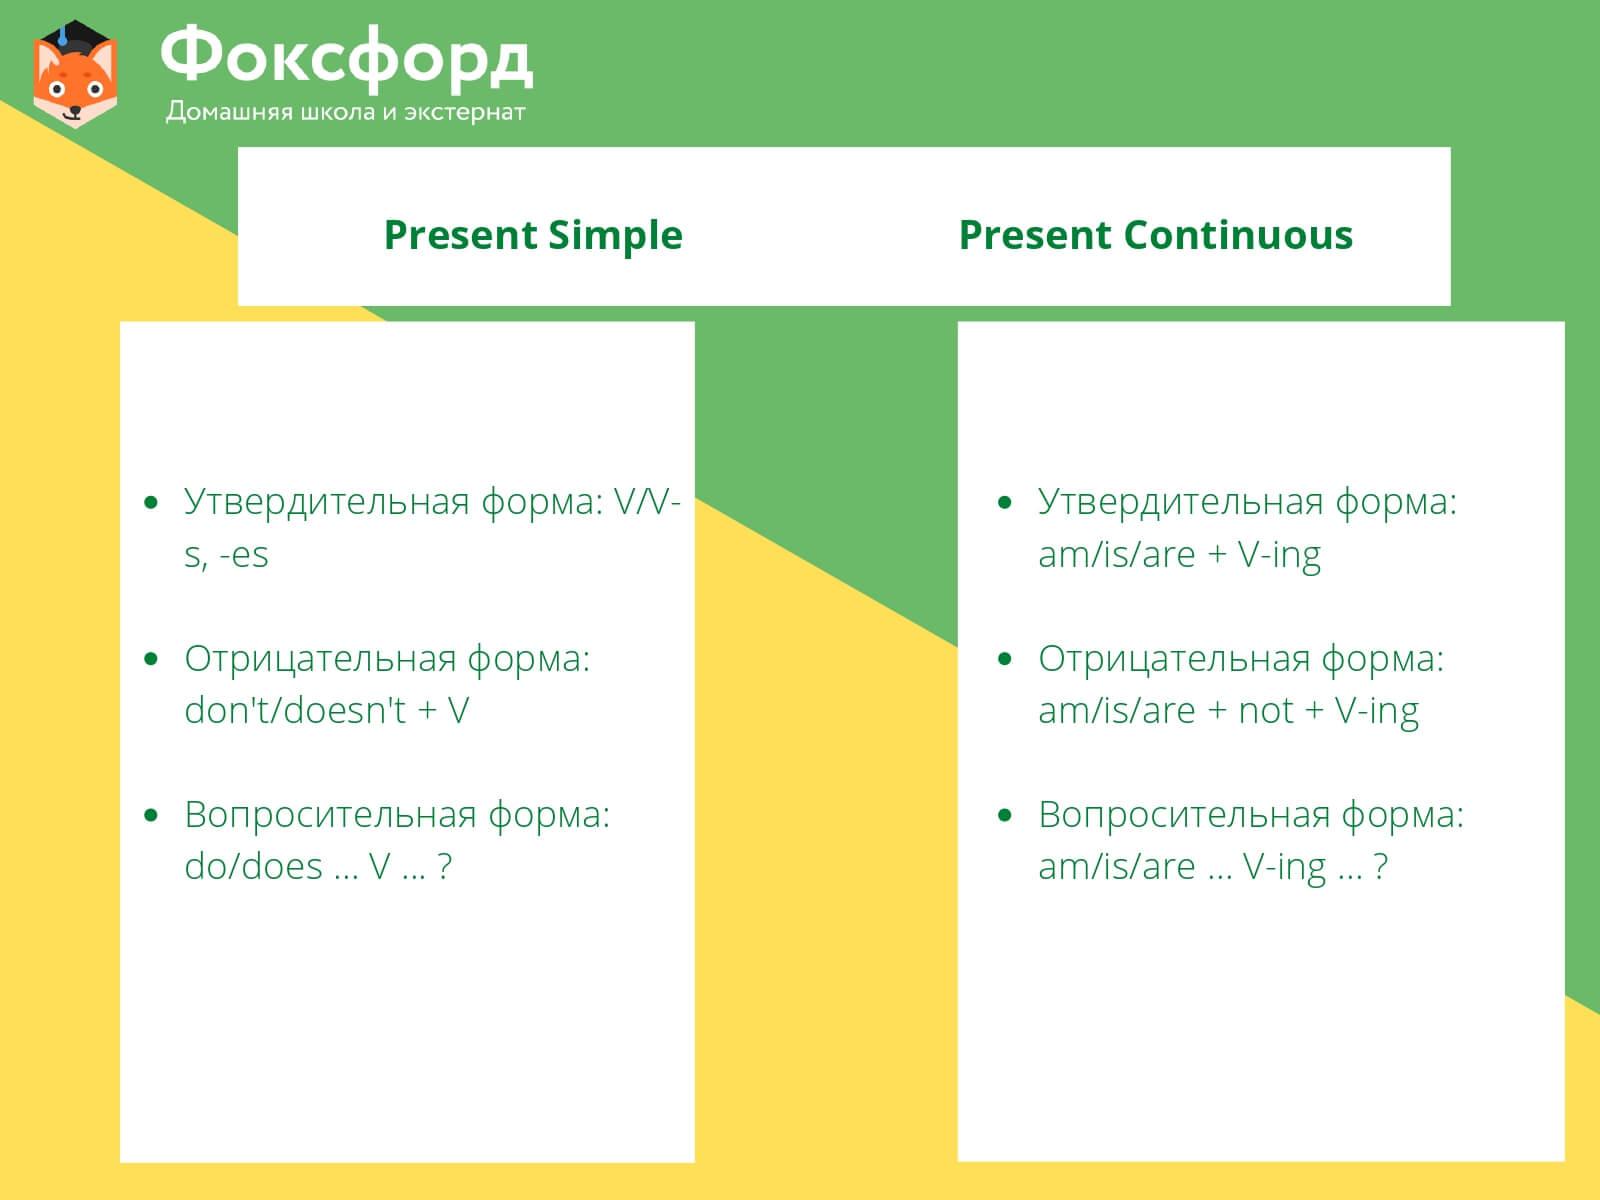 Правила образования предложений с Present Simple и Present Continuous